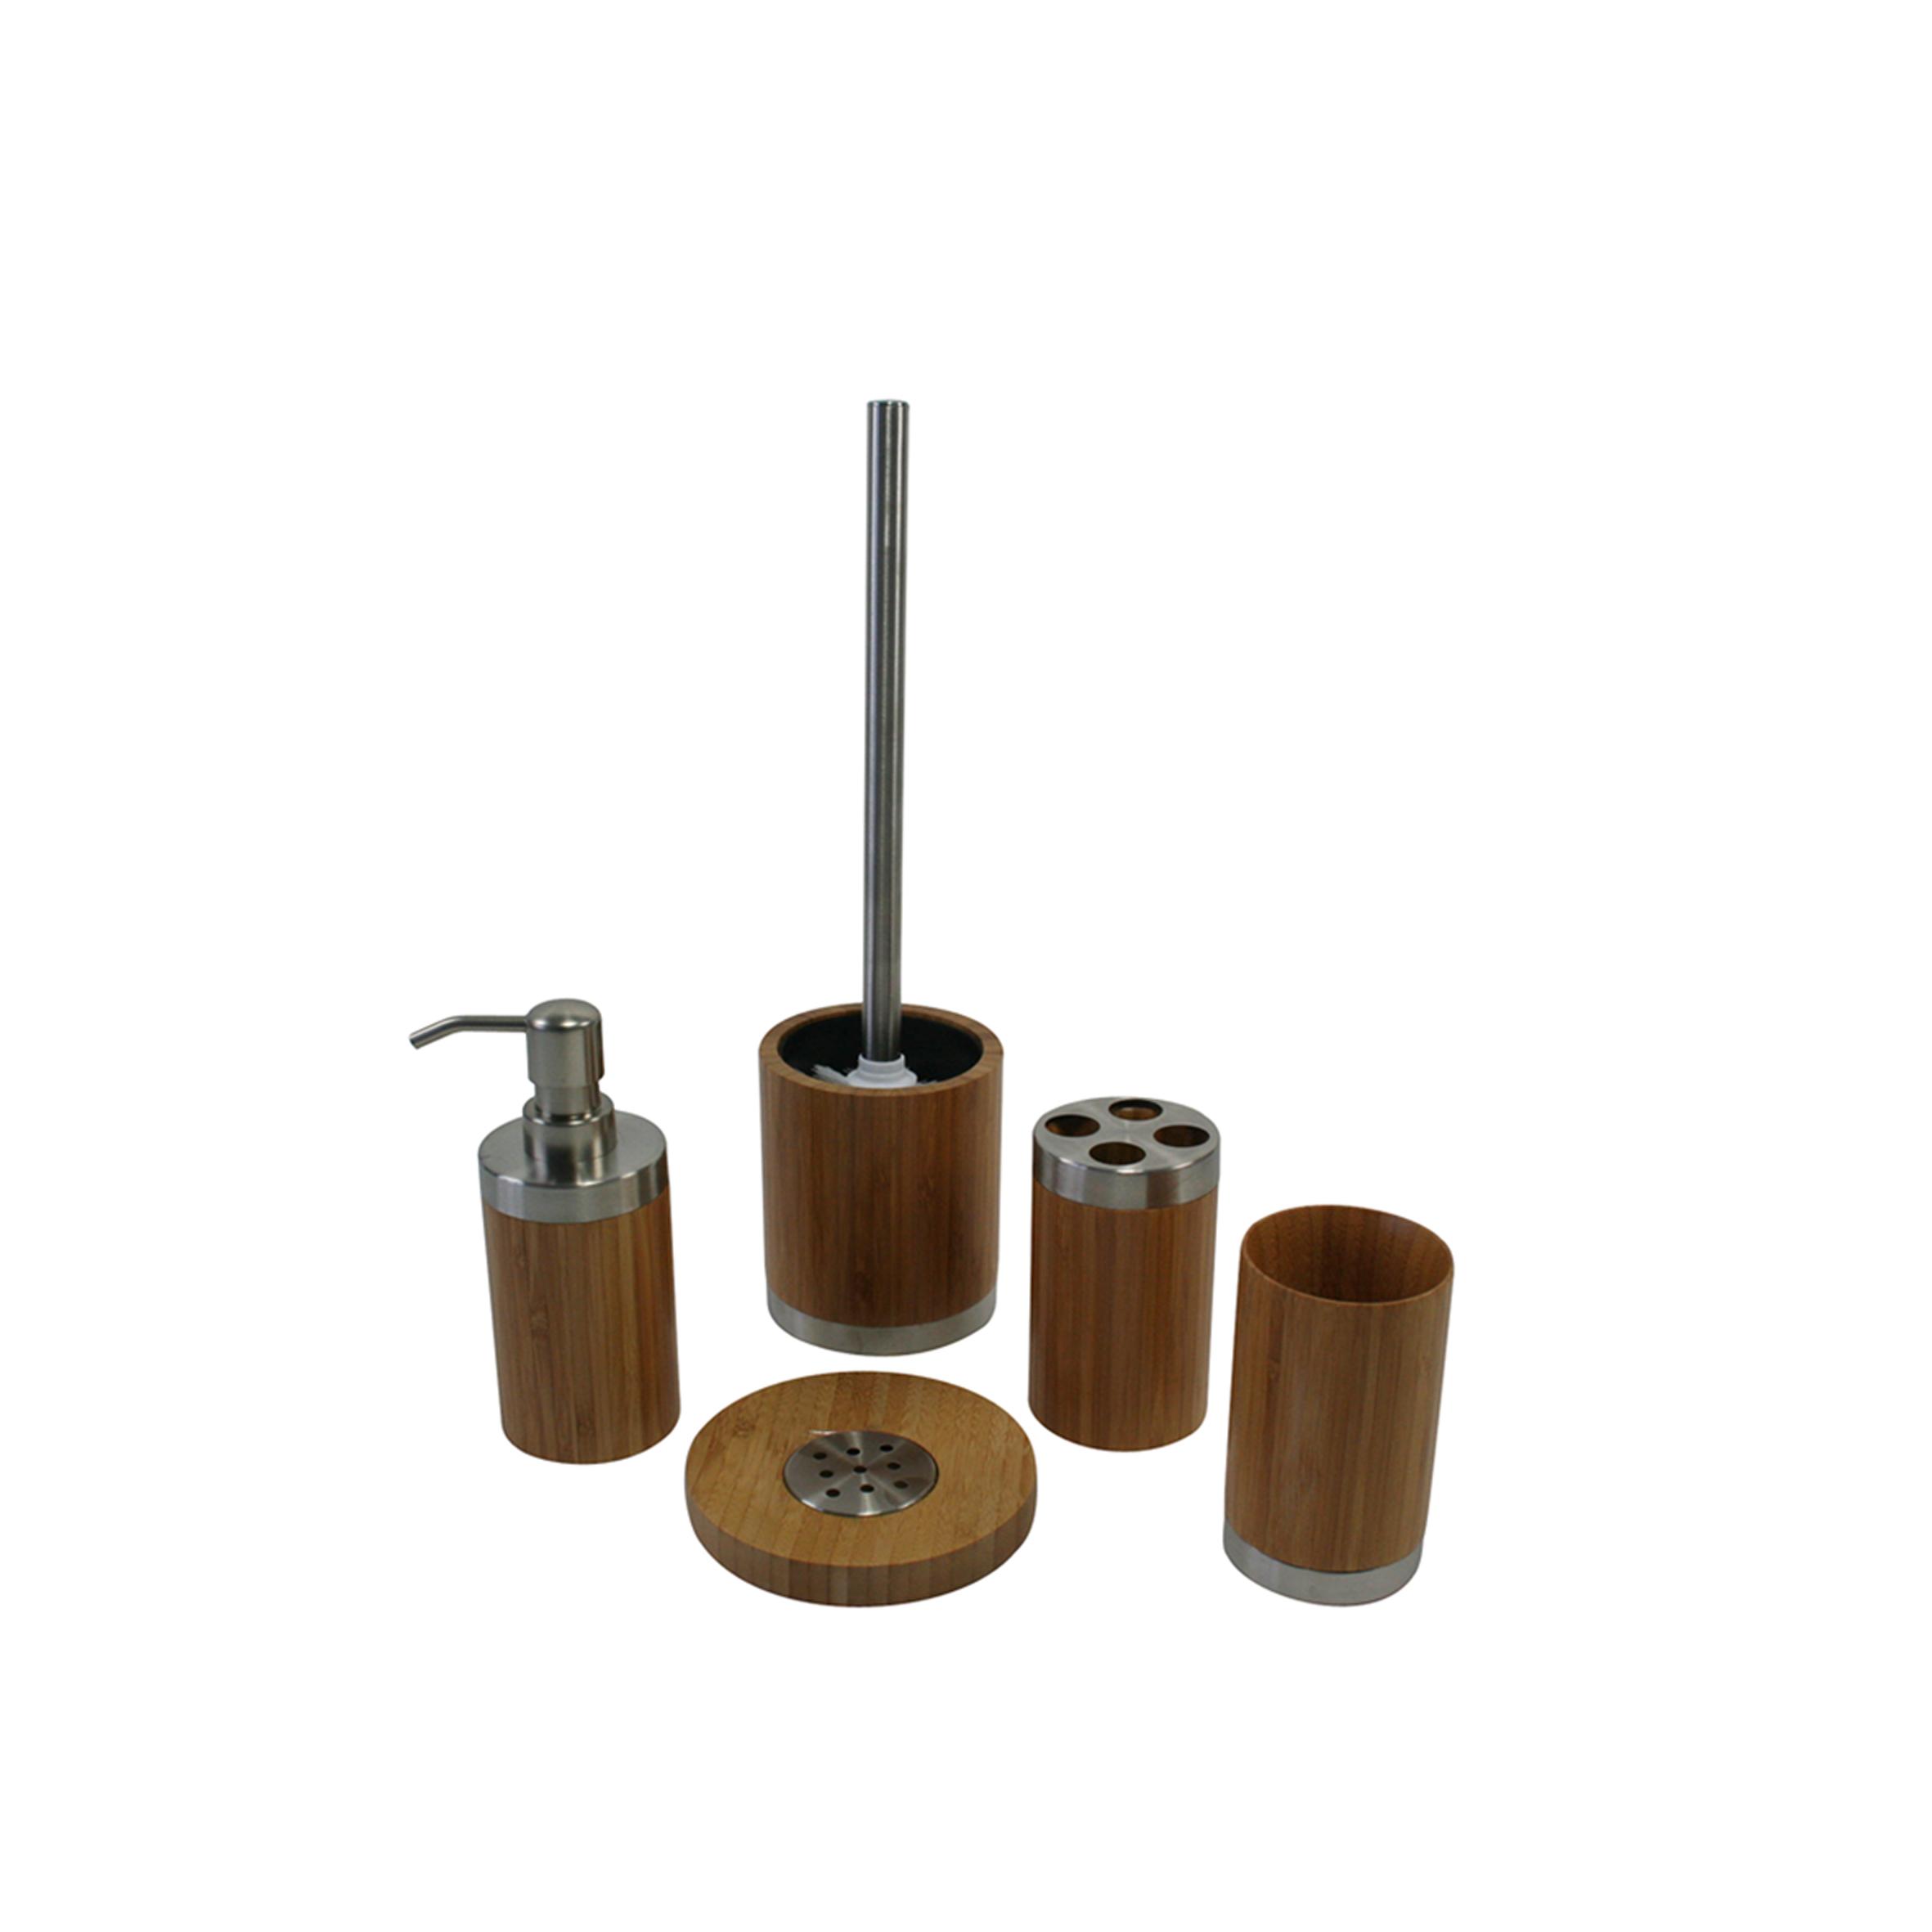 bambus badset badezimmerset wc garnitur 5 teilig neu ebay. Black Bedroom Furniture Sets. Home Design Ideas